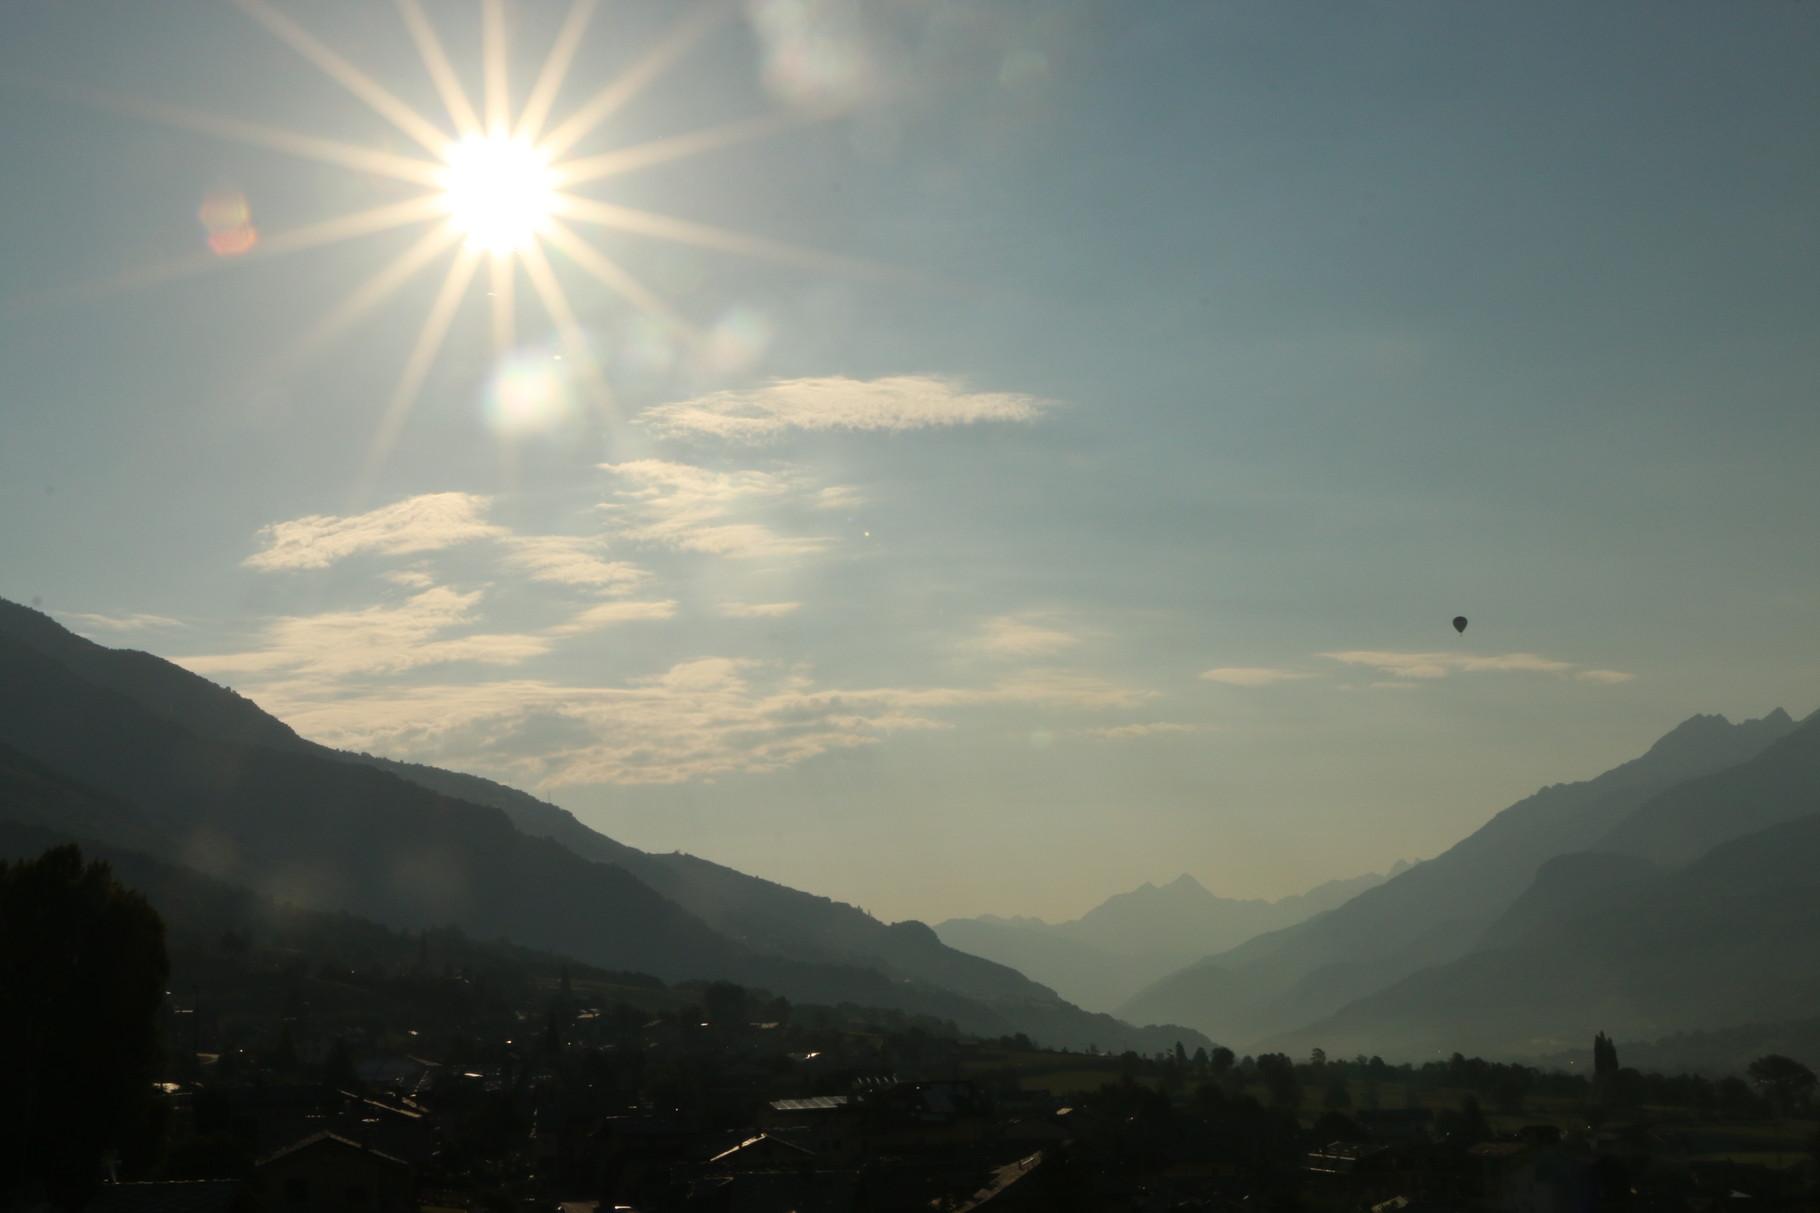 Tappa 3: Aosta - Chatillon | 28,1 km